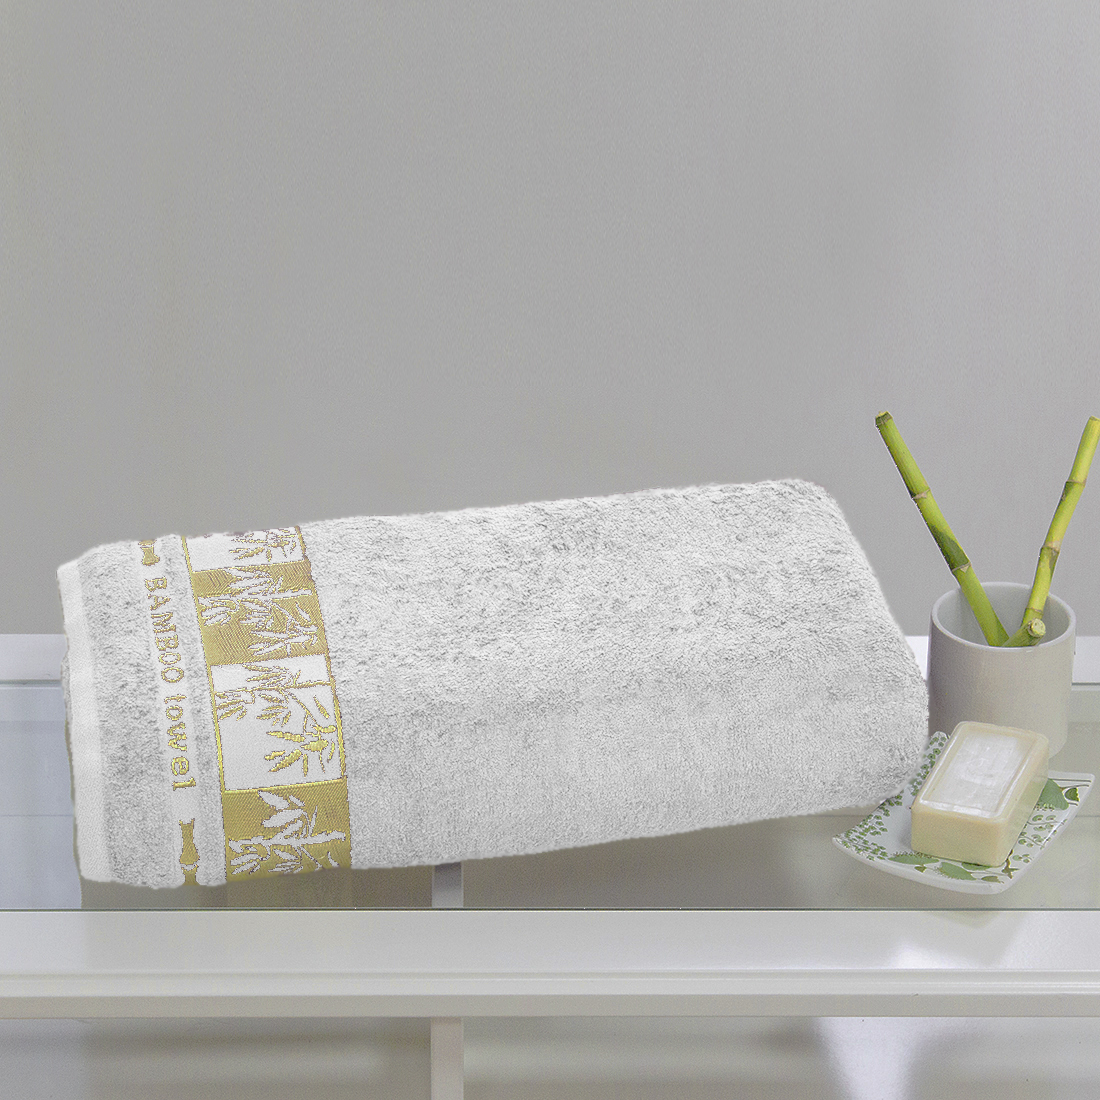 Полотенца Juanna Полотенце Meteor Цвет: Белый (70х140см) полотенце мах familon evidence велюровое 70х140см серое